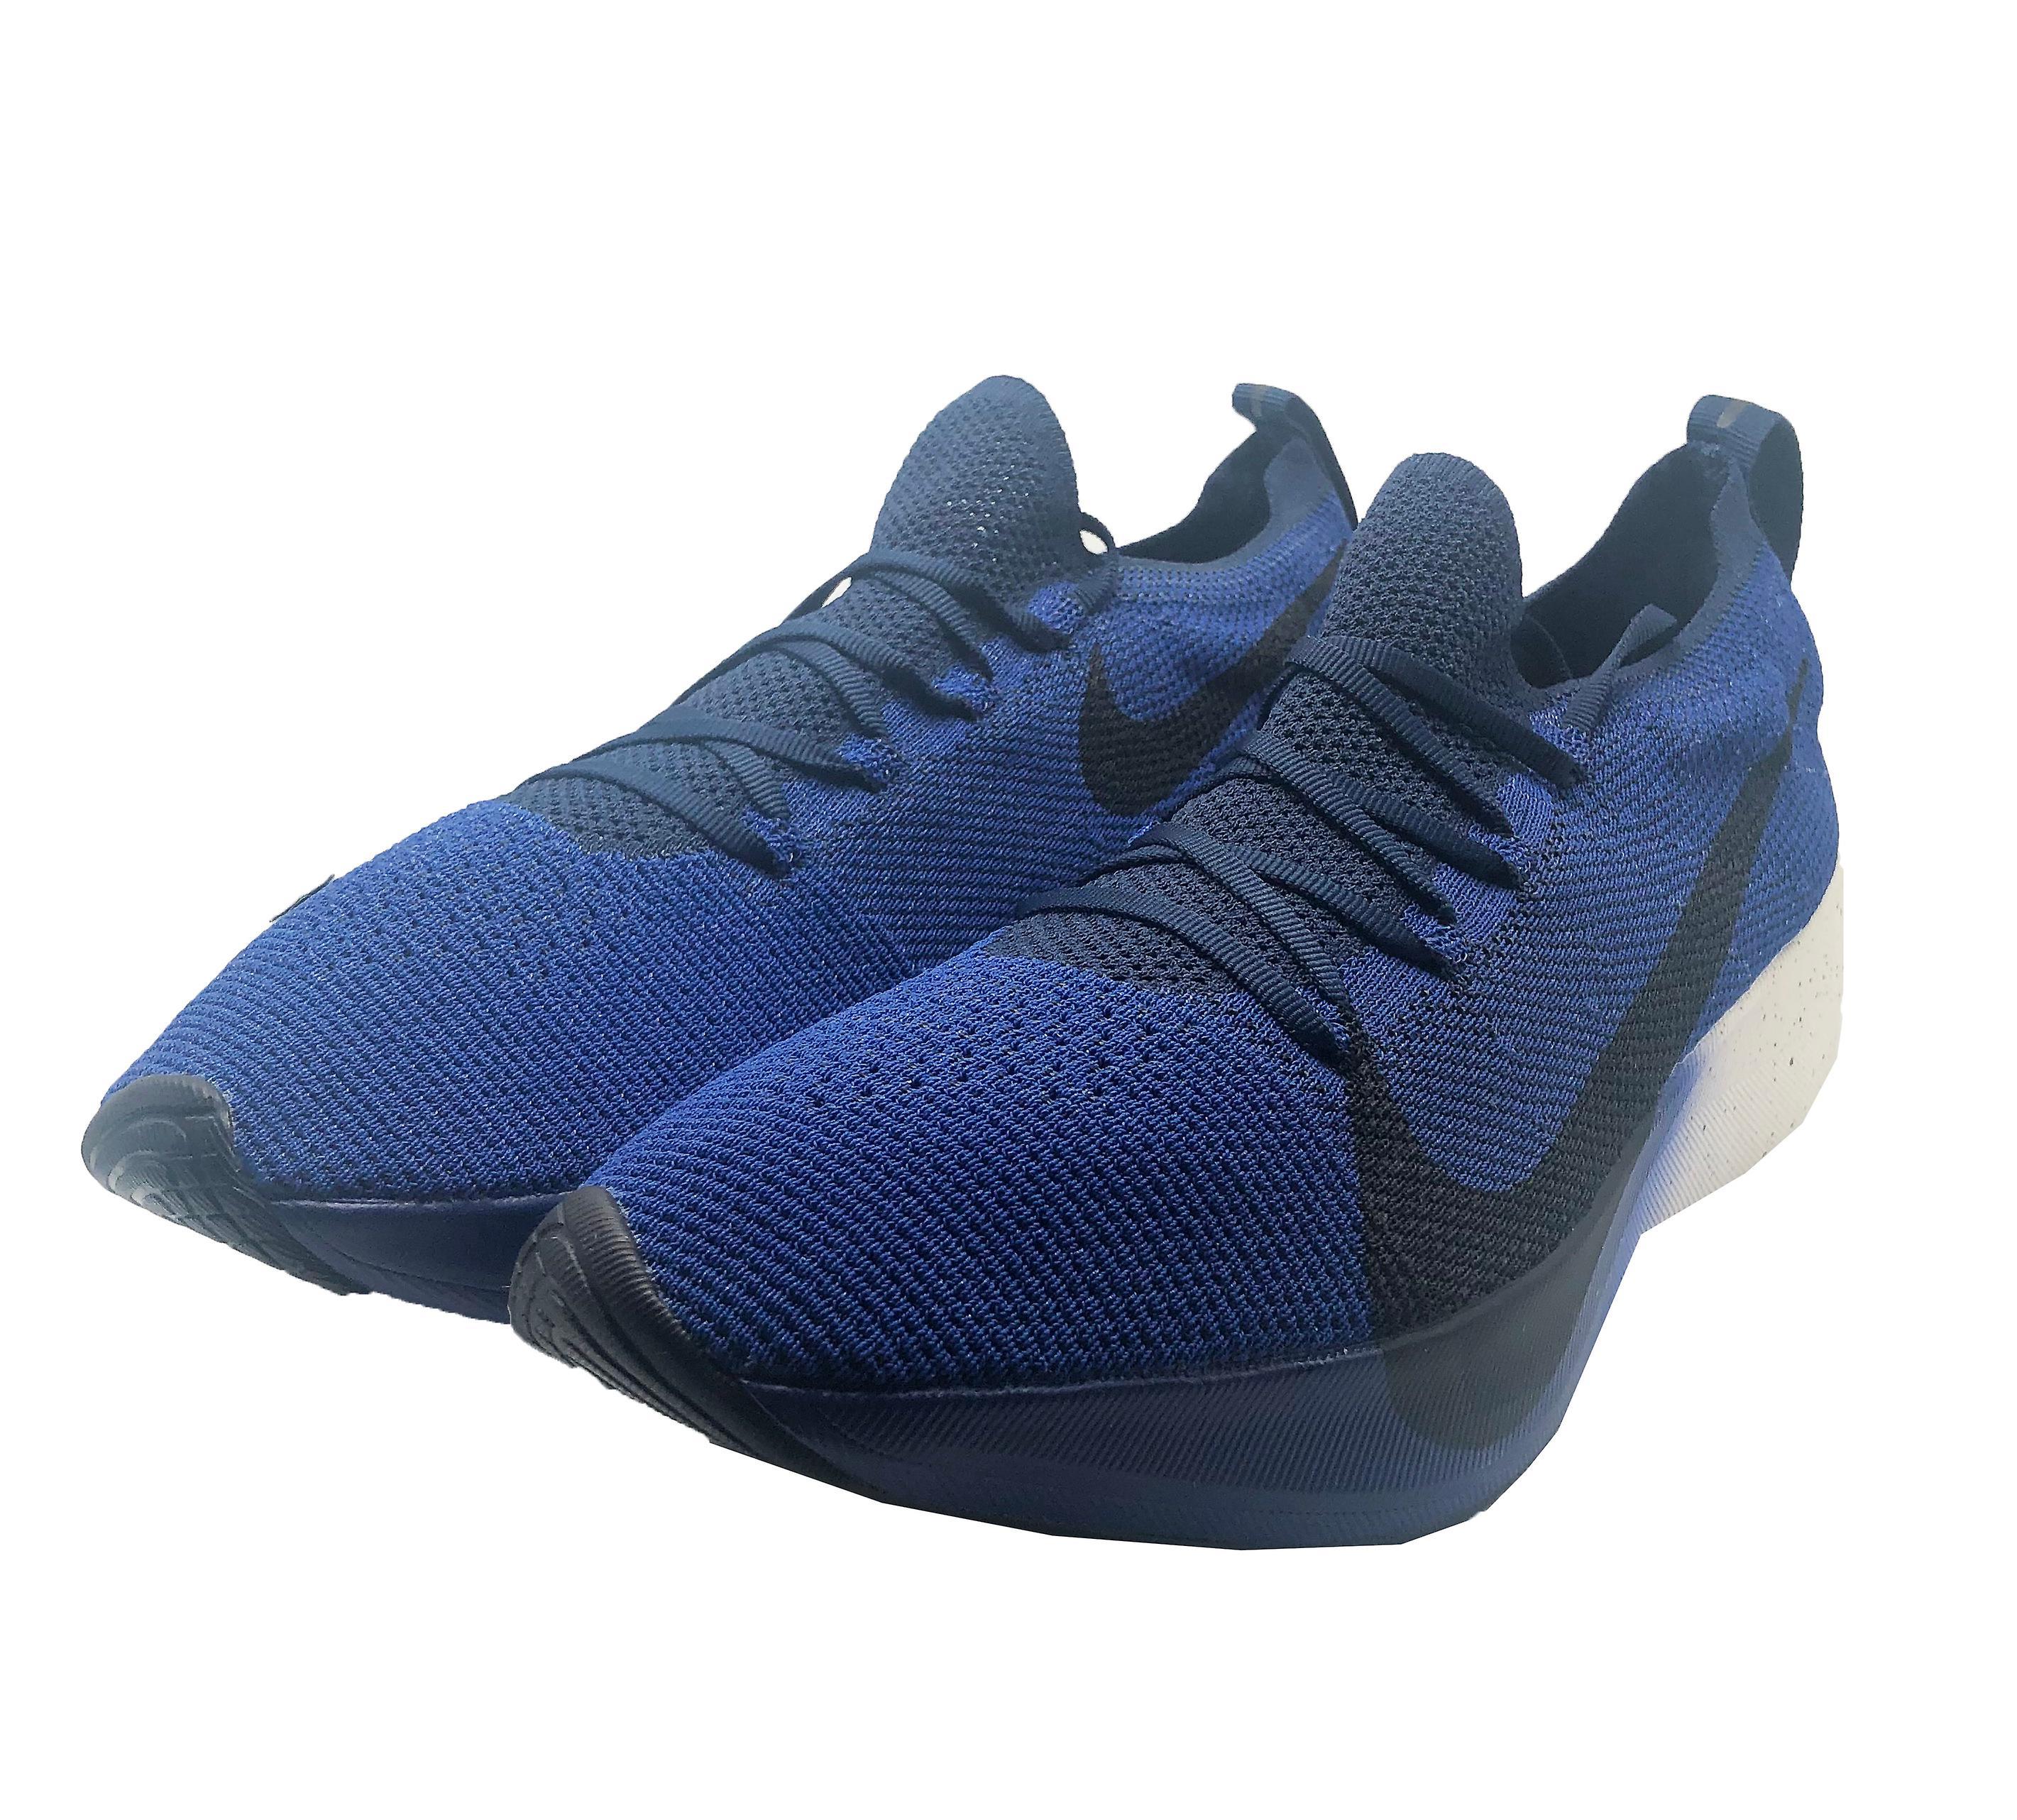 Nike Vapour Street Flyknit AQ1763 400 Herren Trainer